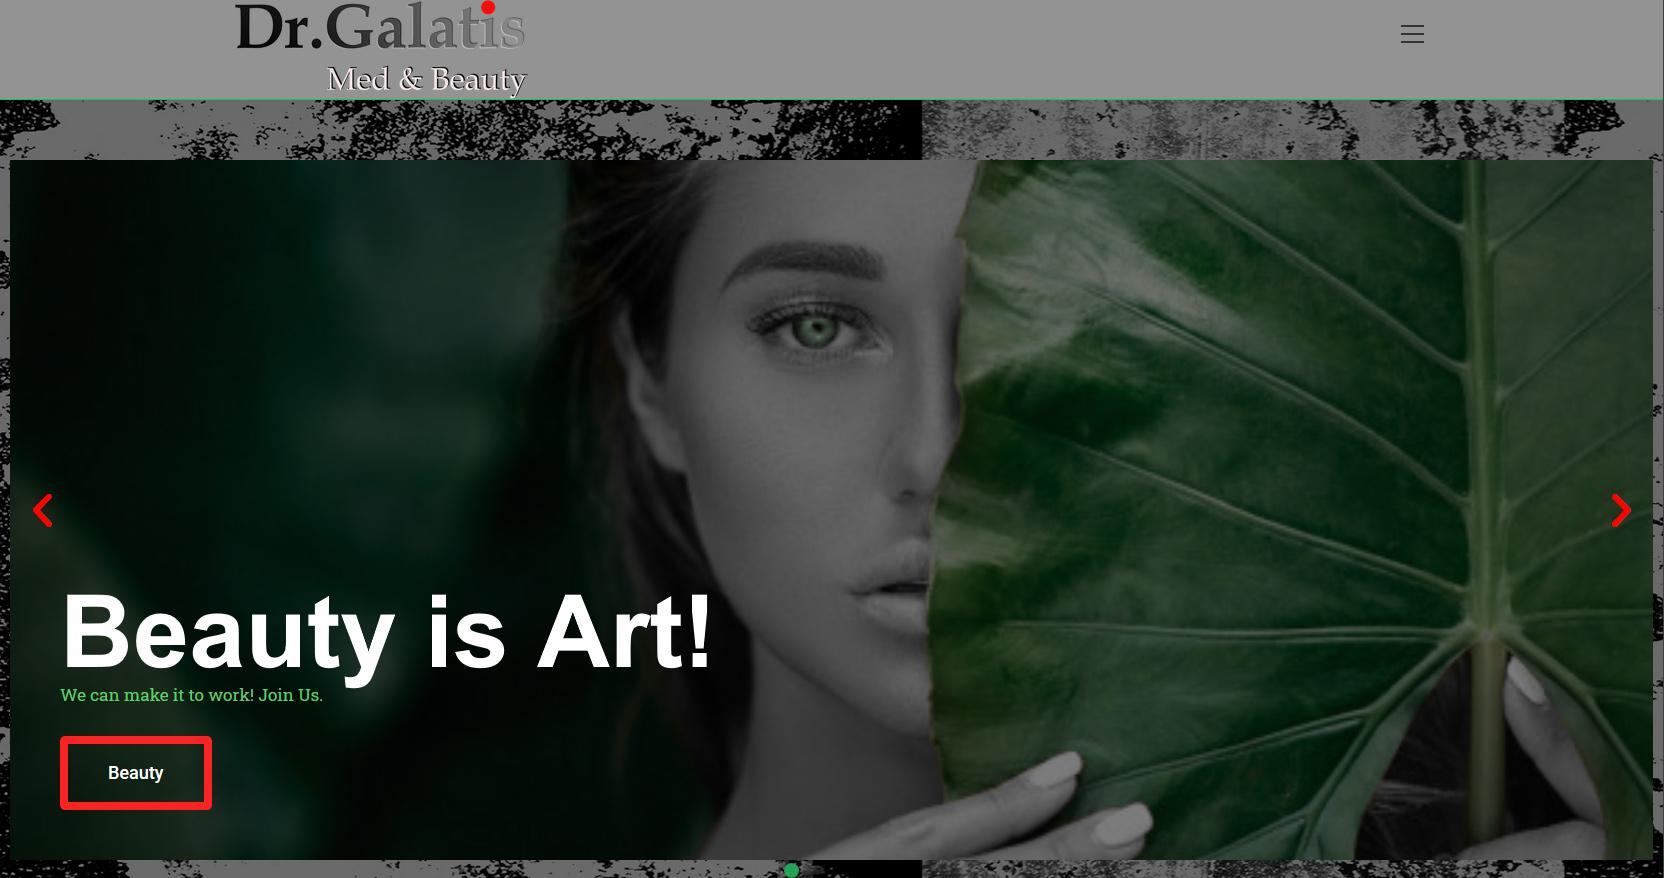 Galatisbeauty Frontpage image